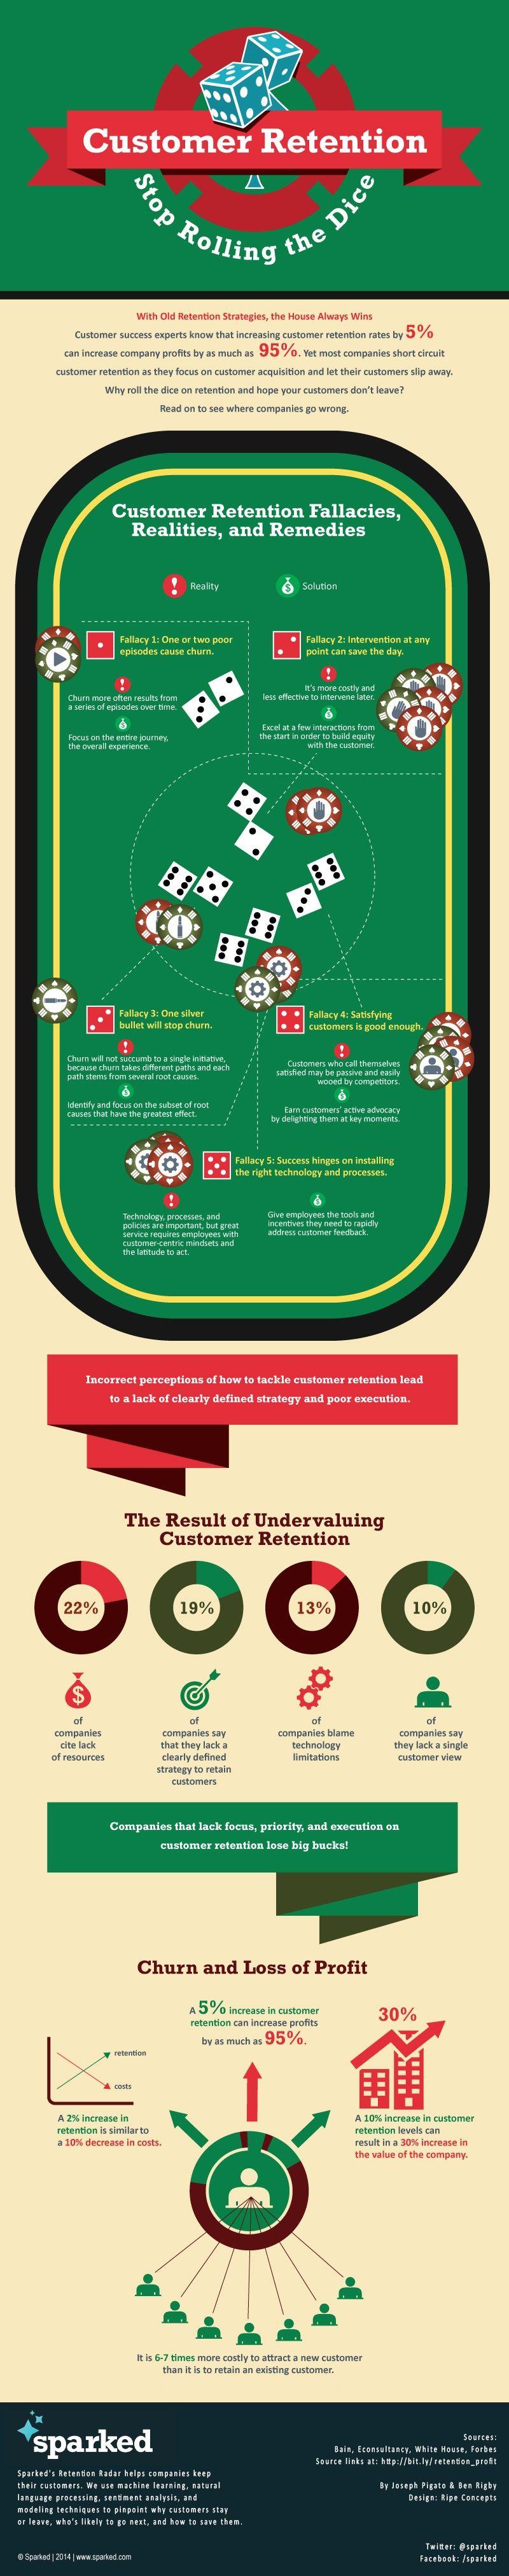 Online gambling customer retention double down free casino play